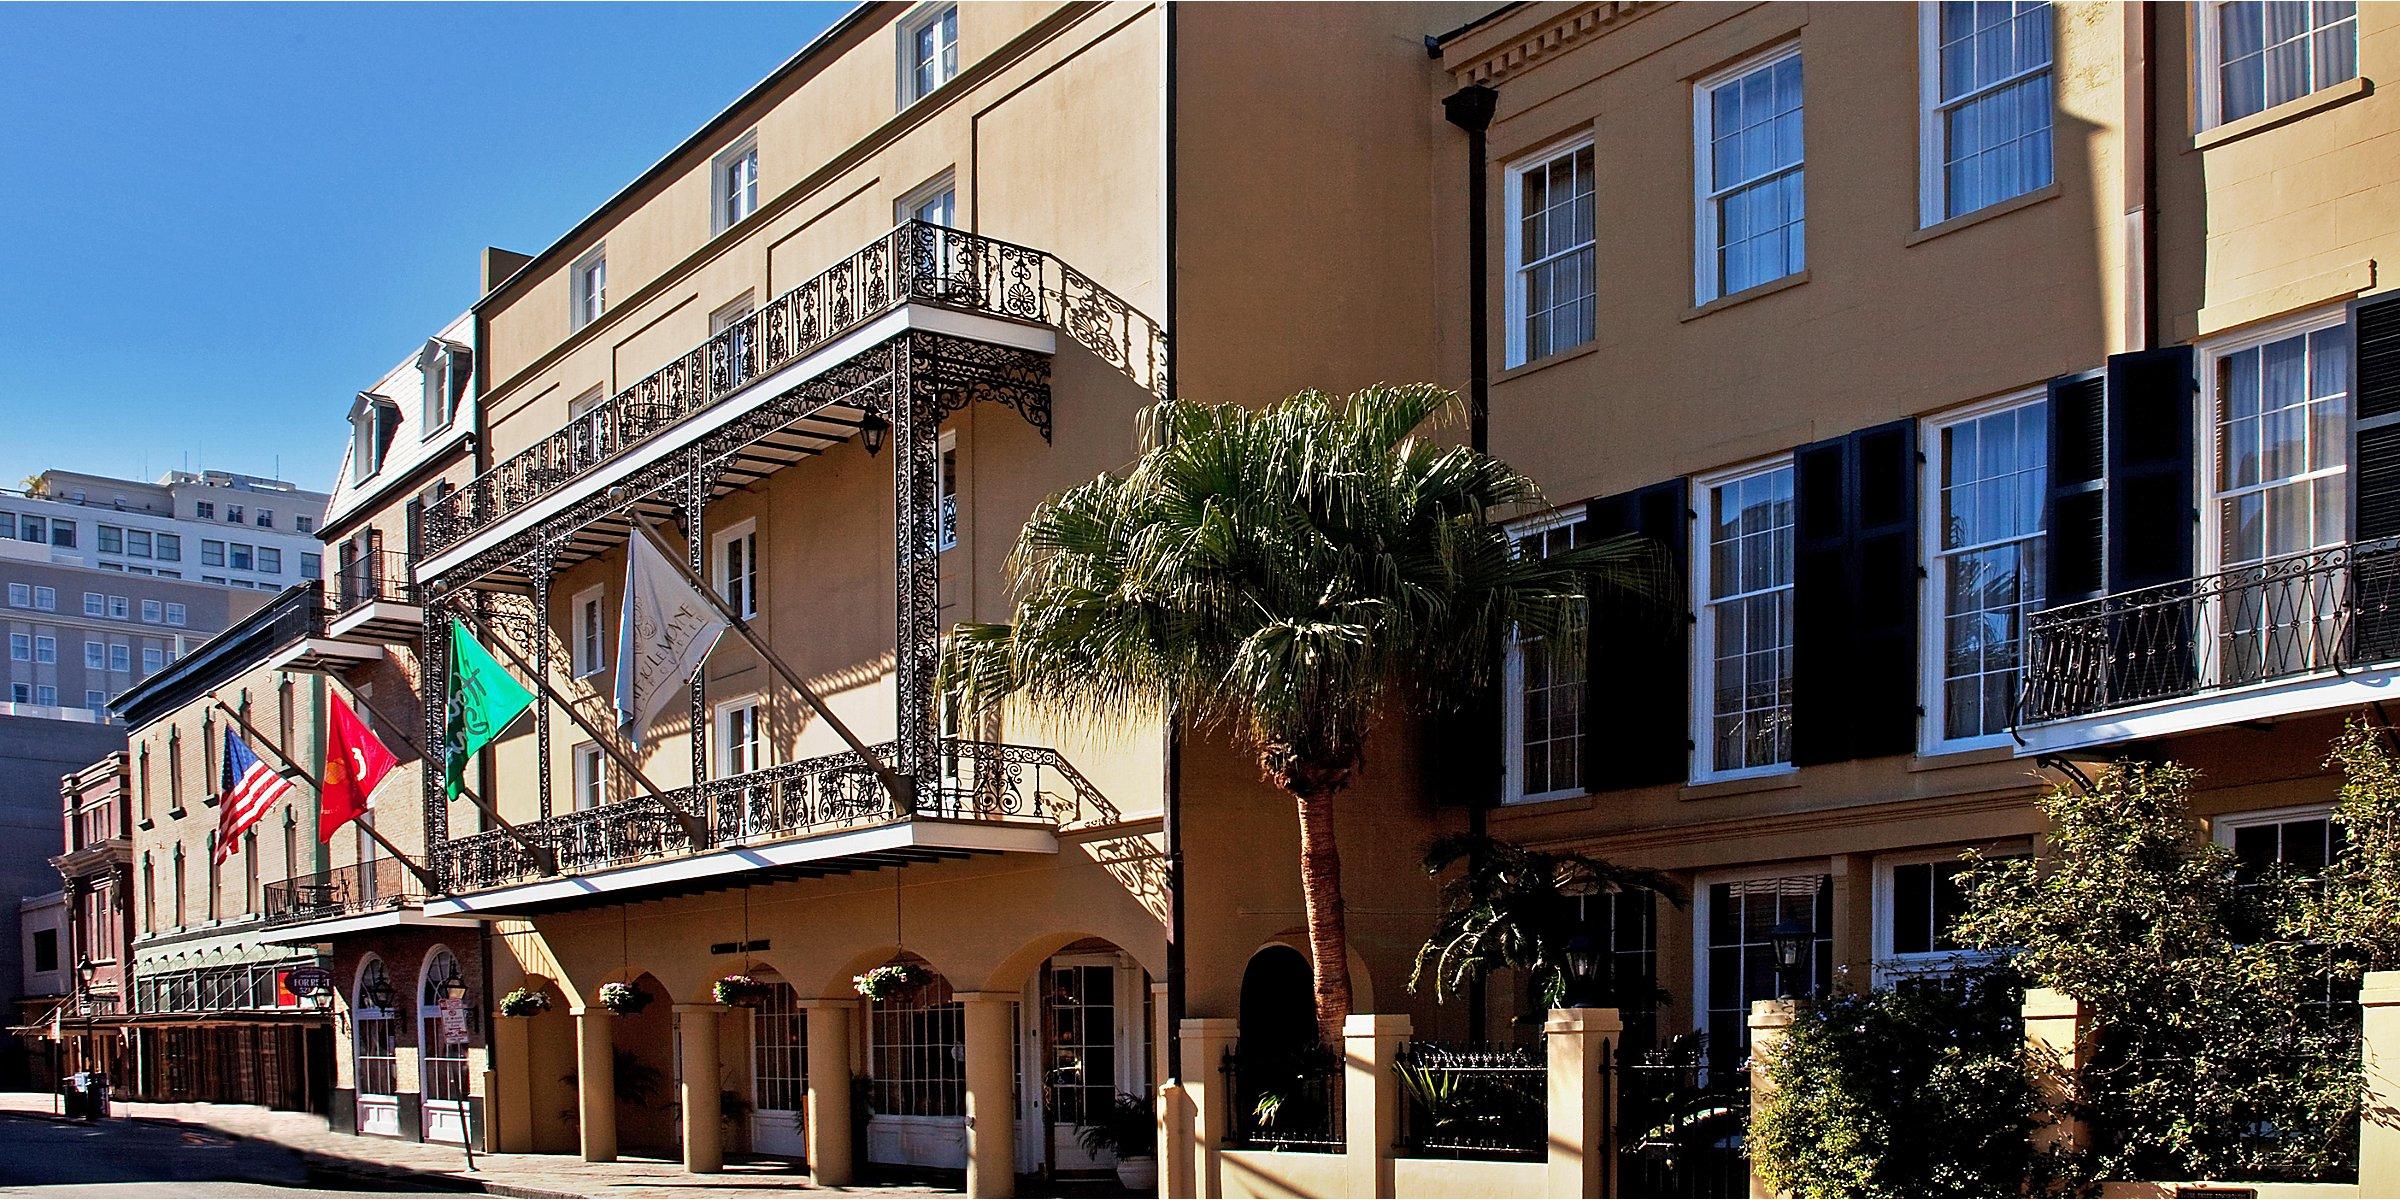 Hotels In French Quarter Holiday Inn French Quarter Chateau Lemoyne